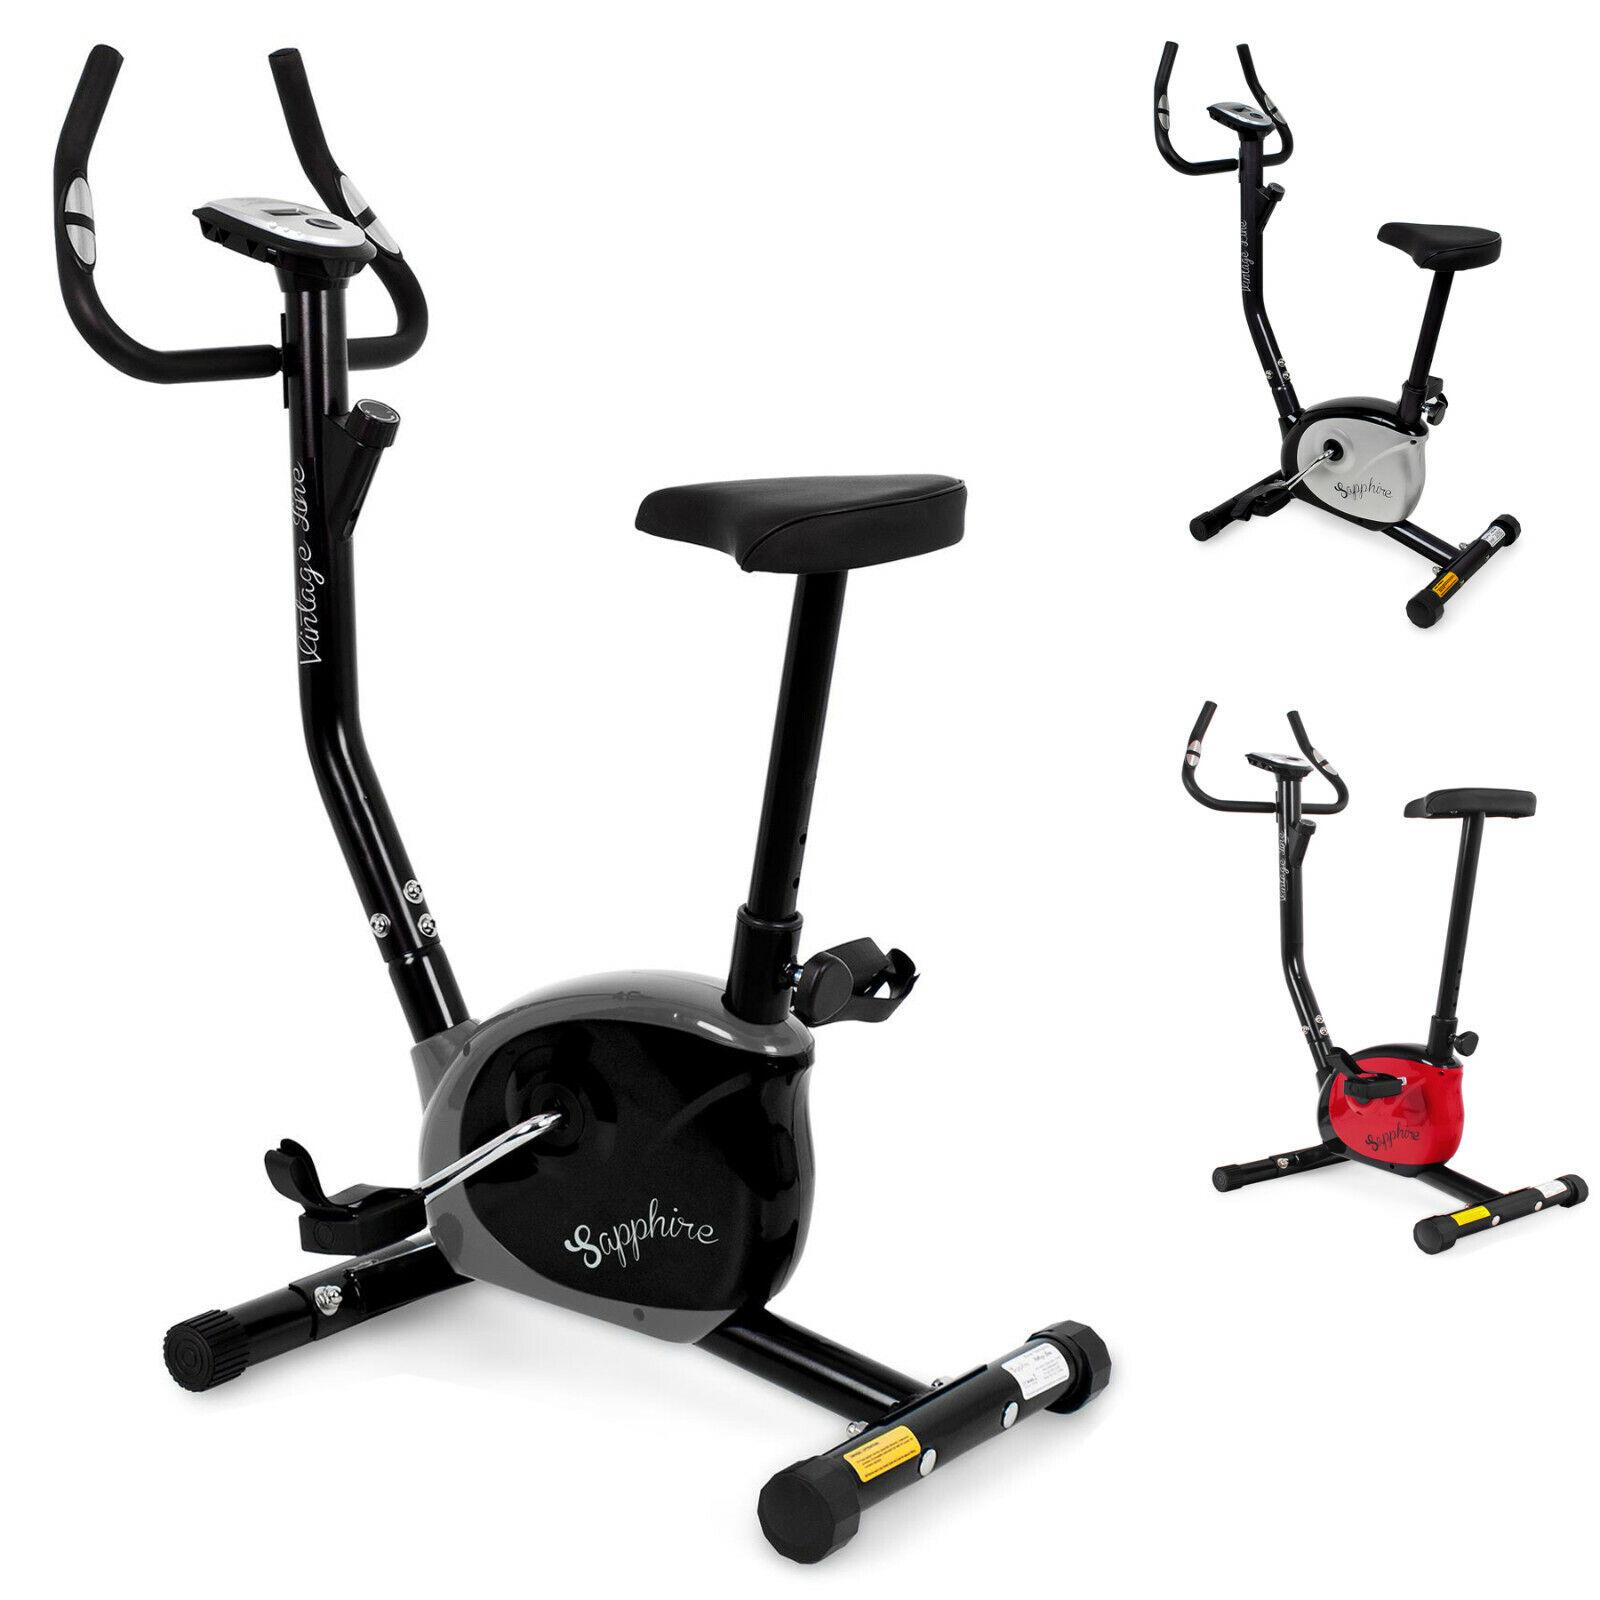 Heimtrainer Fitnessbike Fitnessrad Fahrrad Hometrainer Fitnessgerät Sensoren